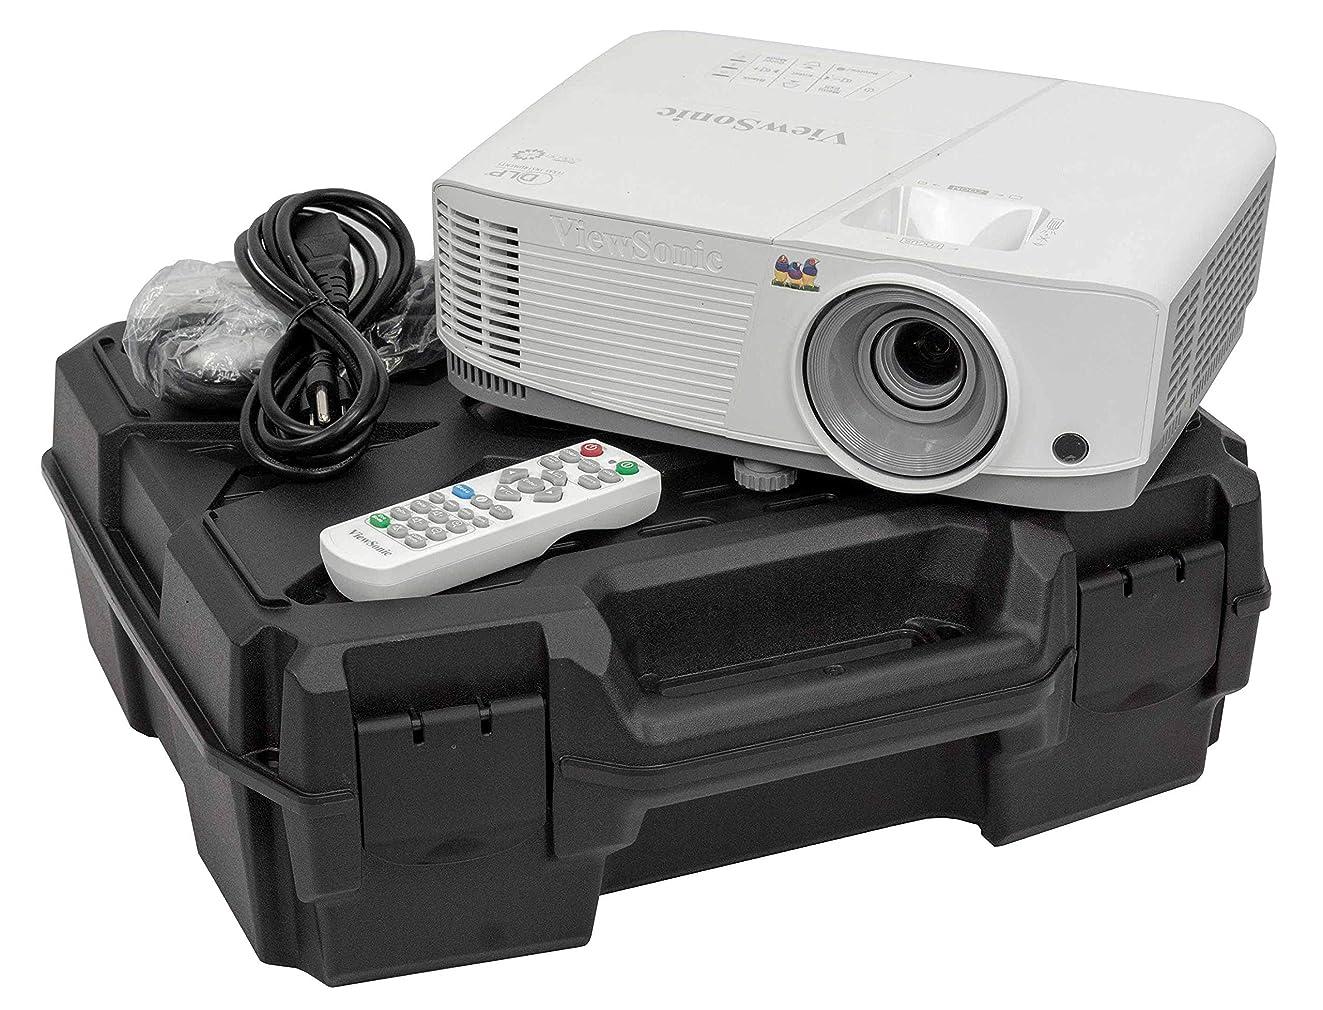 Case Club Projector Case Compatible with Epson VS250, VS350, VS355 Projectors Plus Cords and Remote